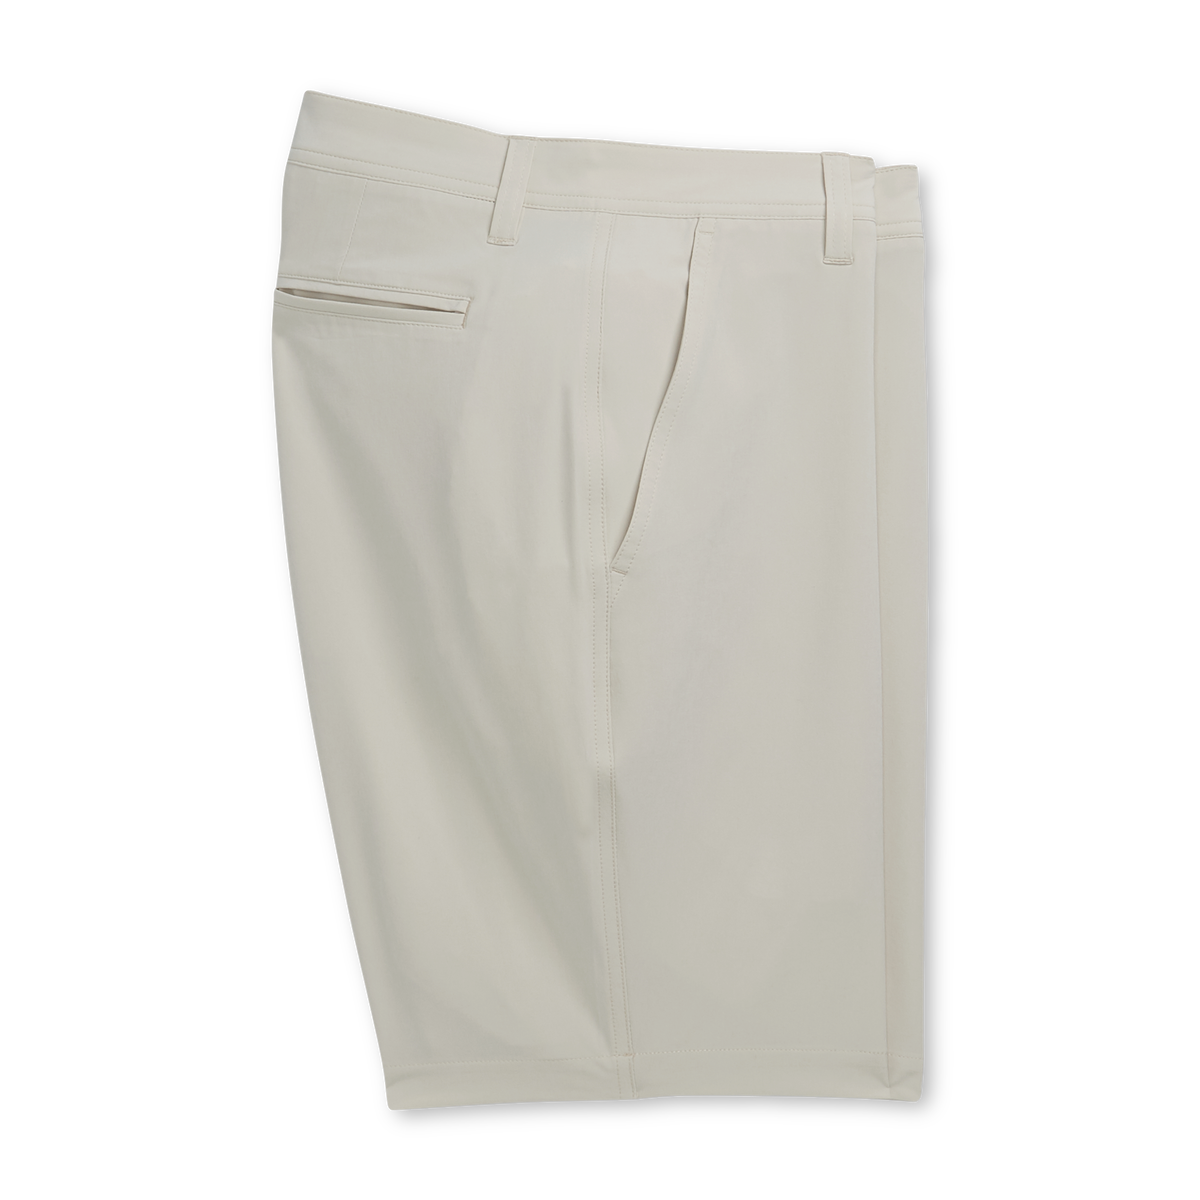 FootJoy Shorts (Stone) : $78